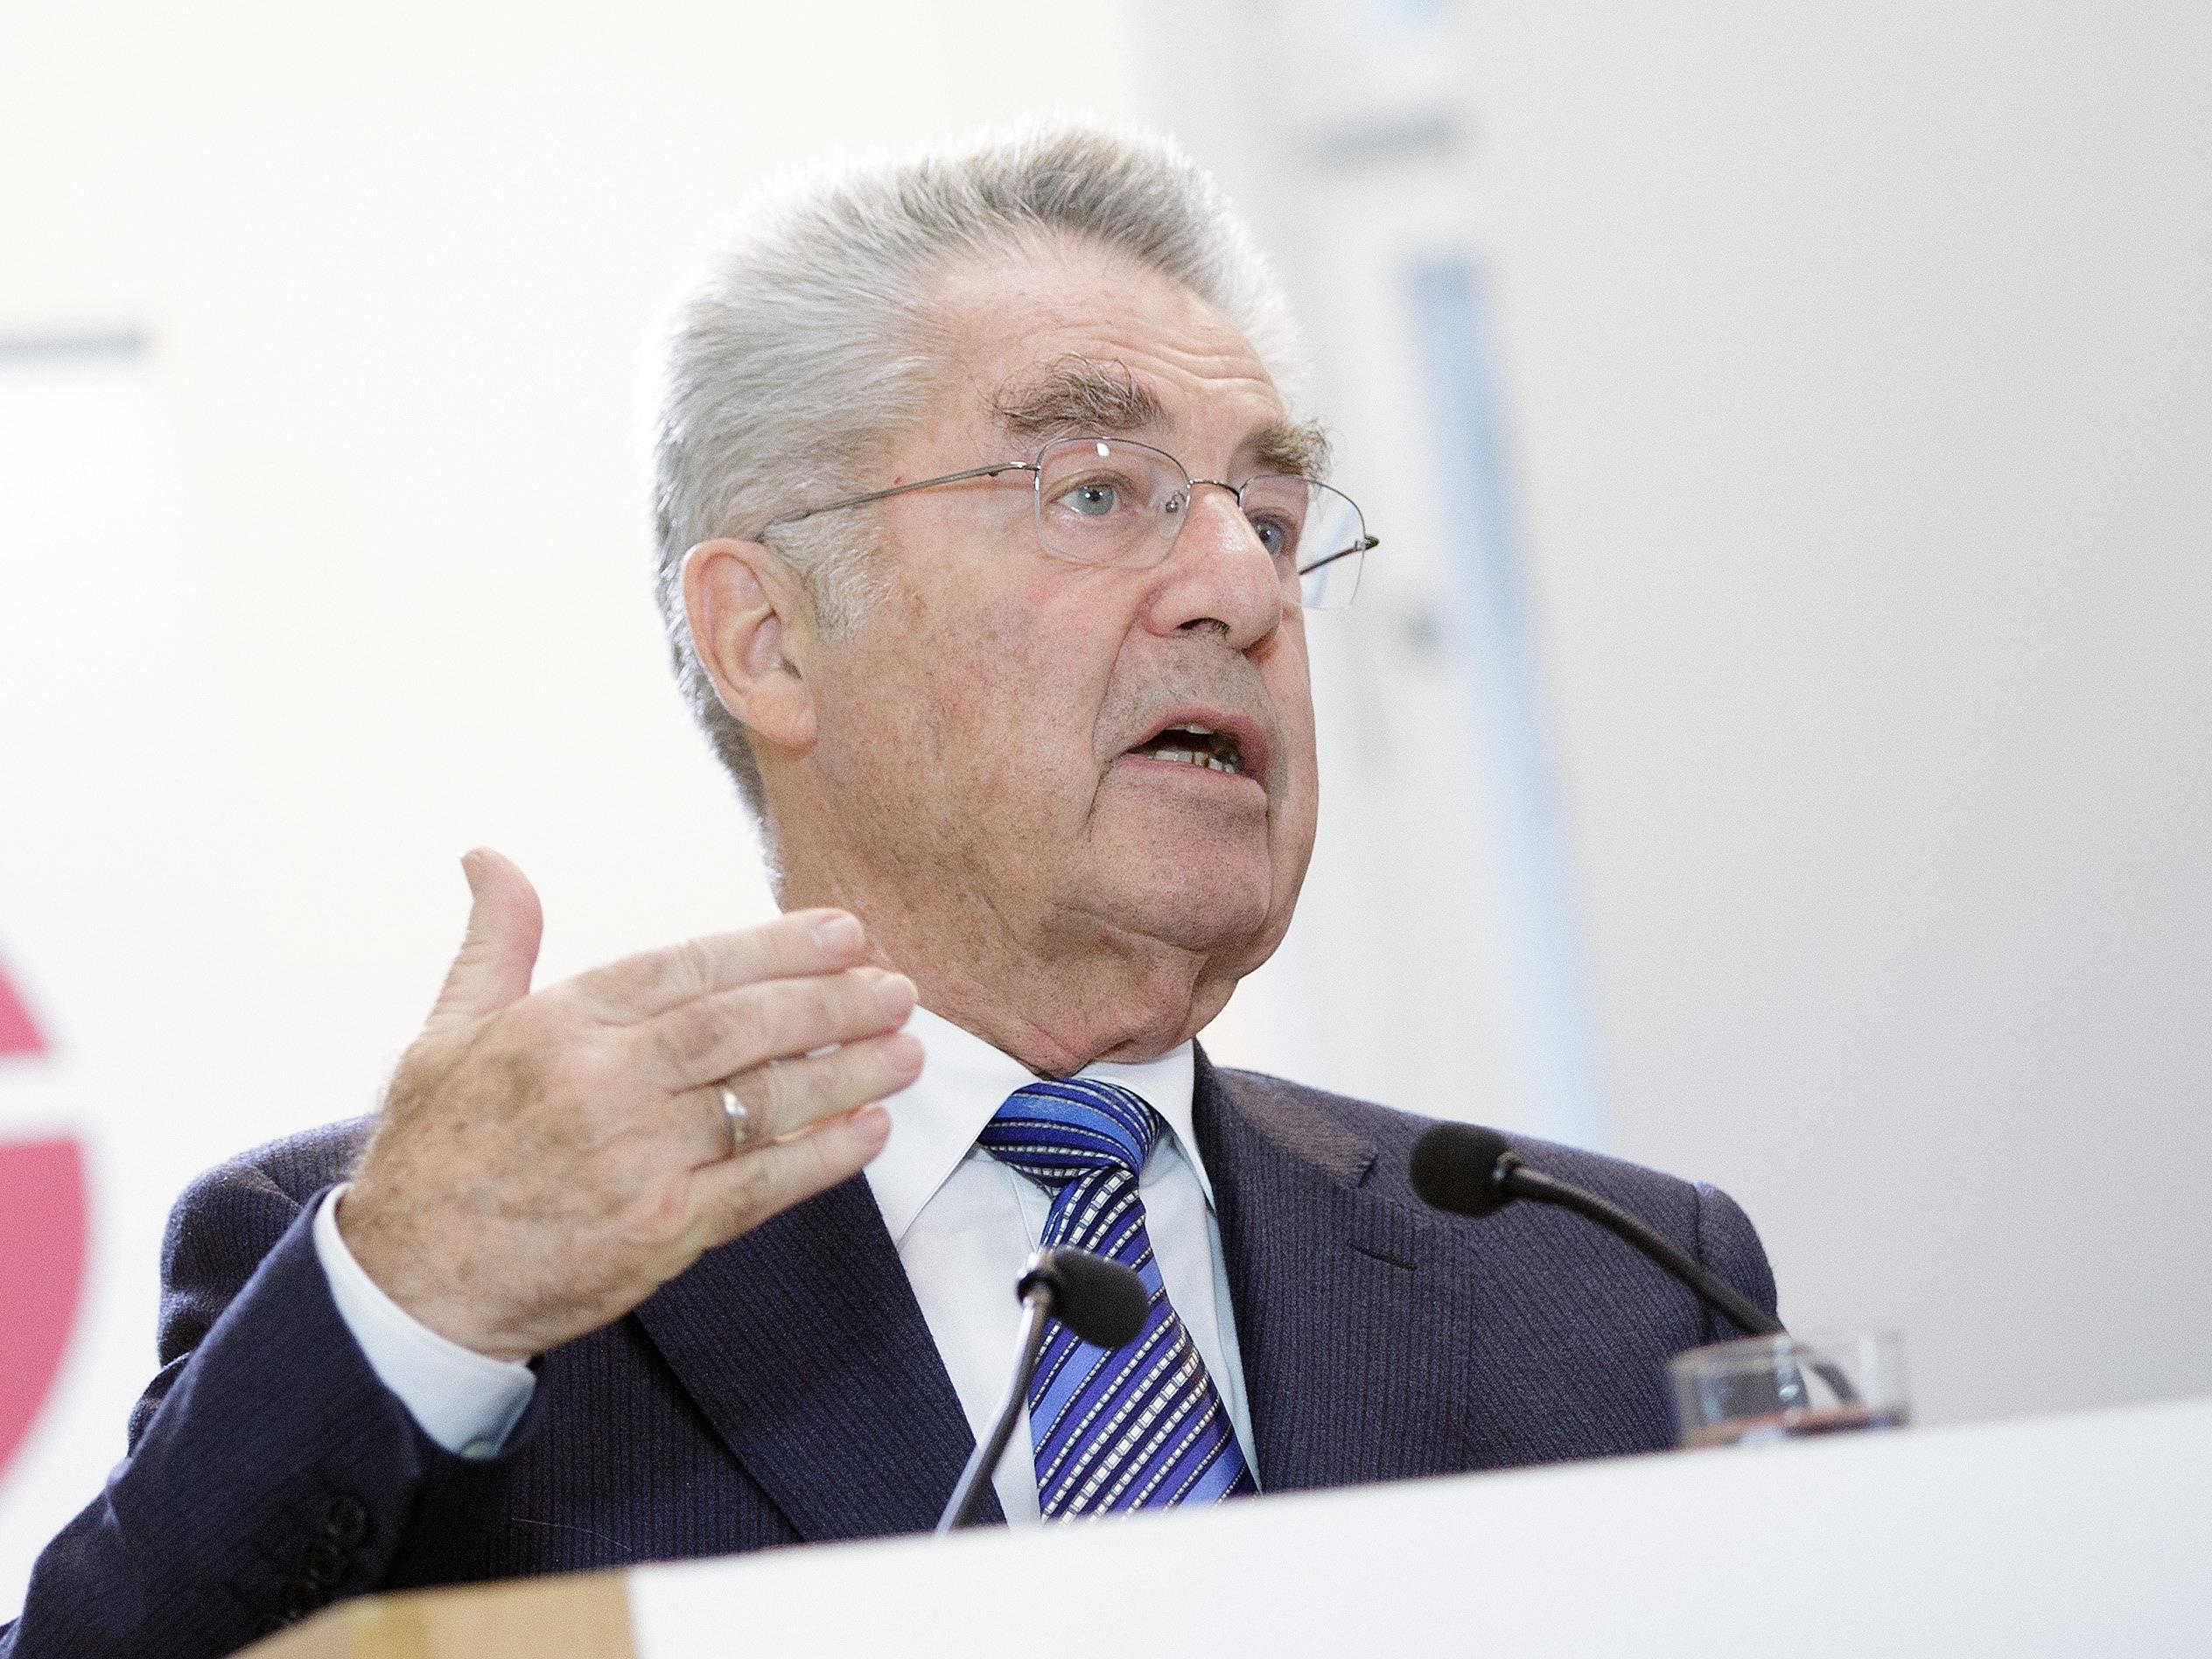 Regierung soll laut BP Fischer Obergrenzen-Streit beenden.